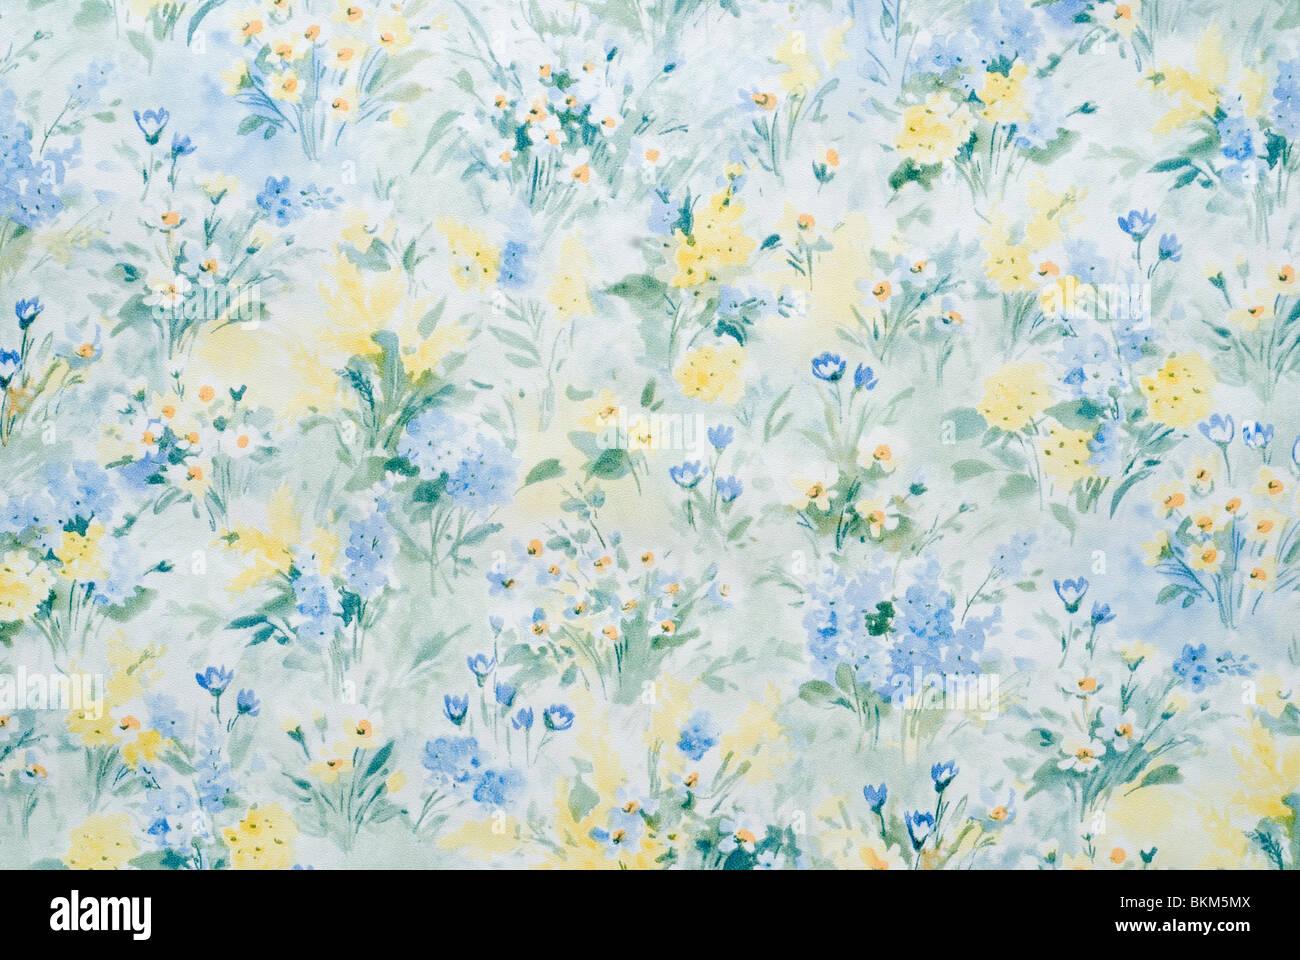 Papel tapiz florido Imagen De Stock